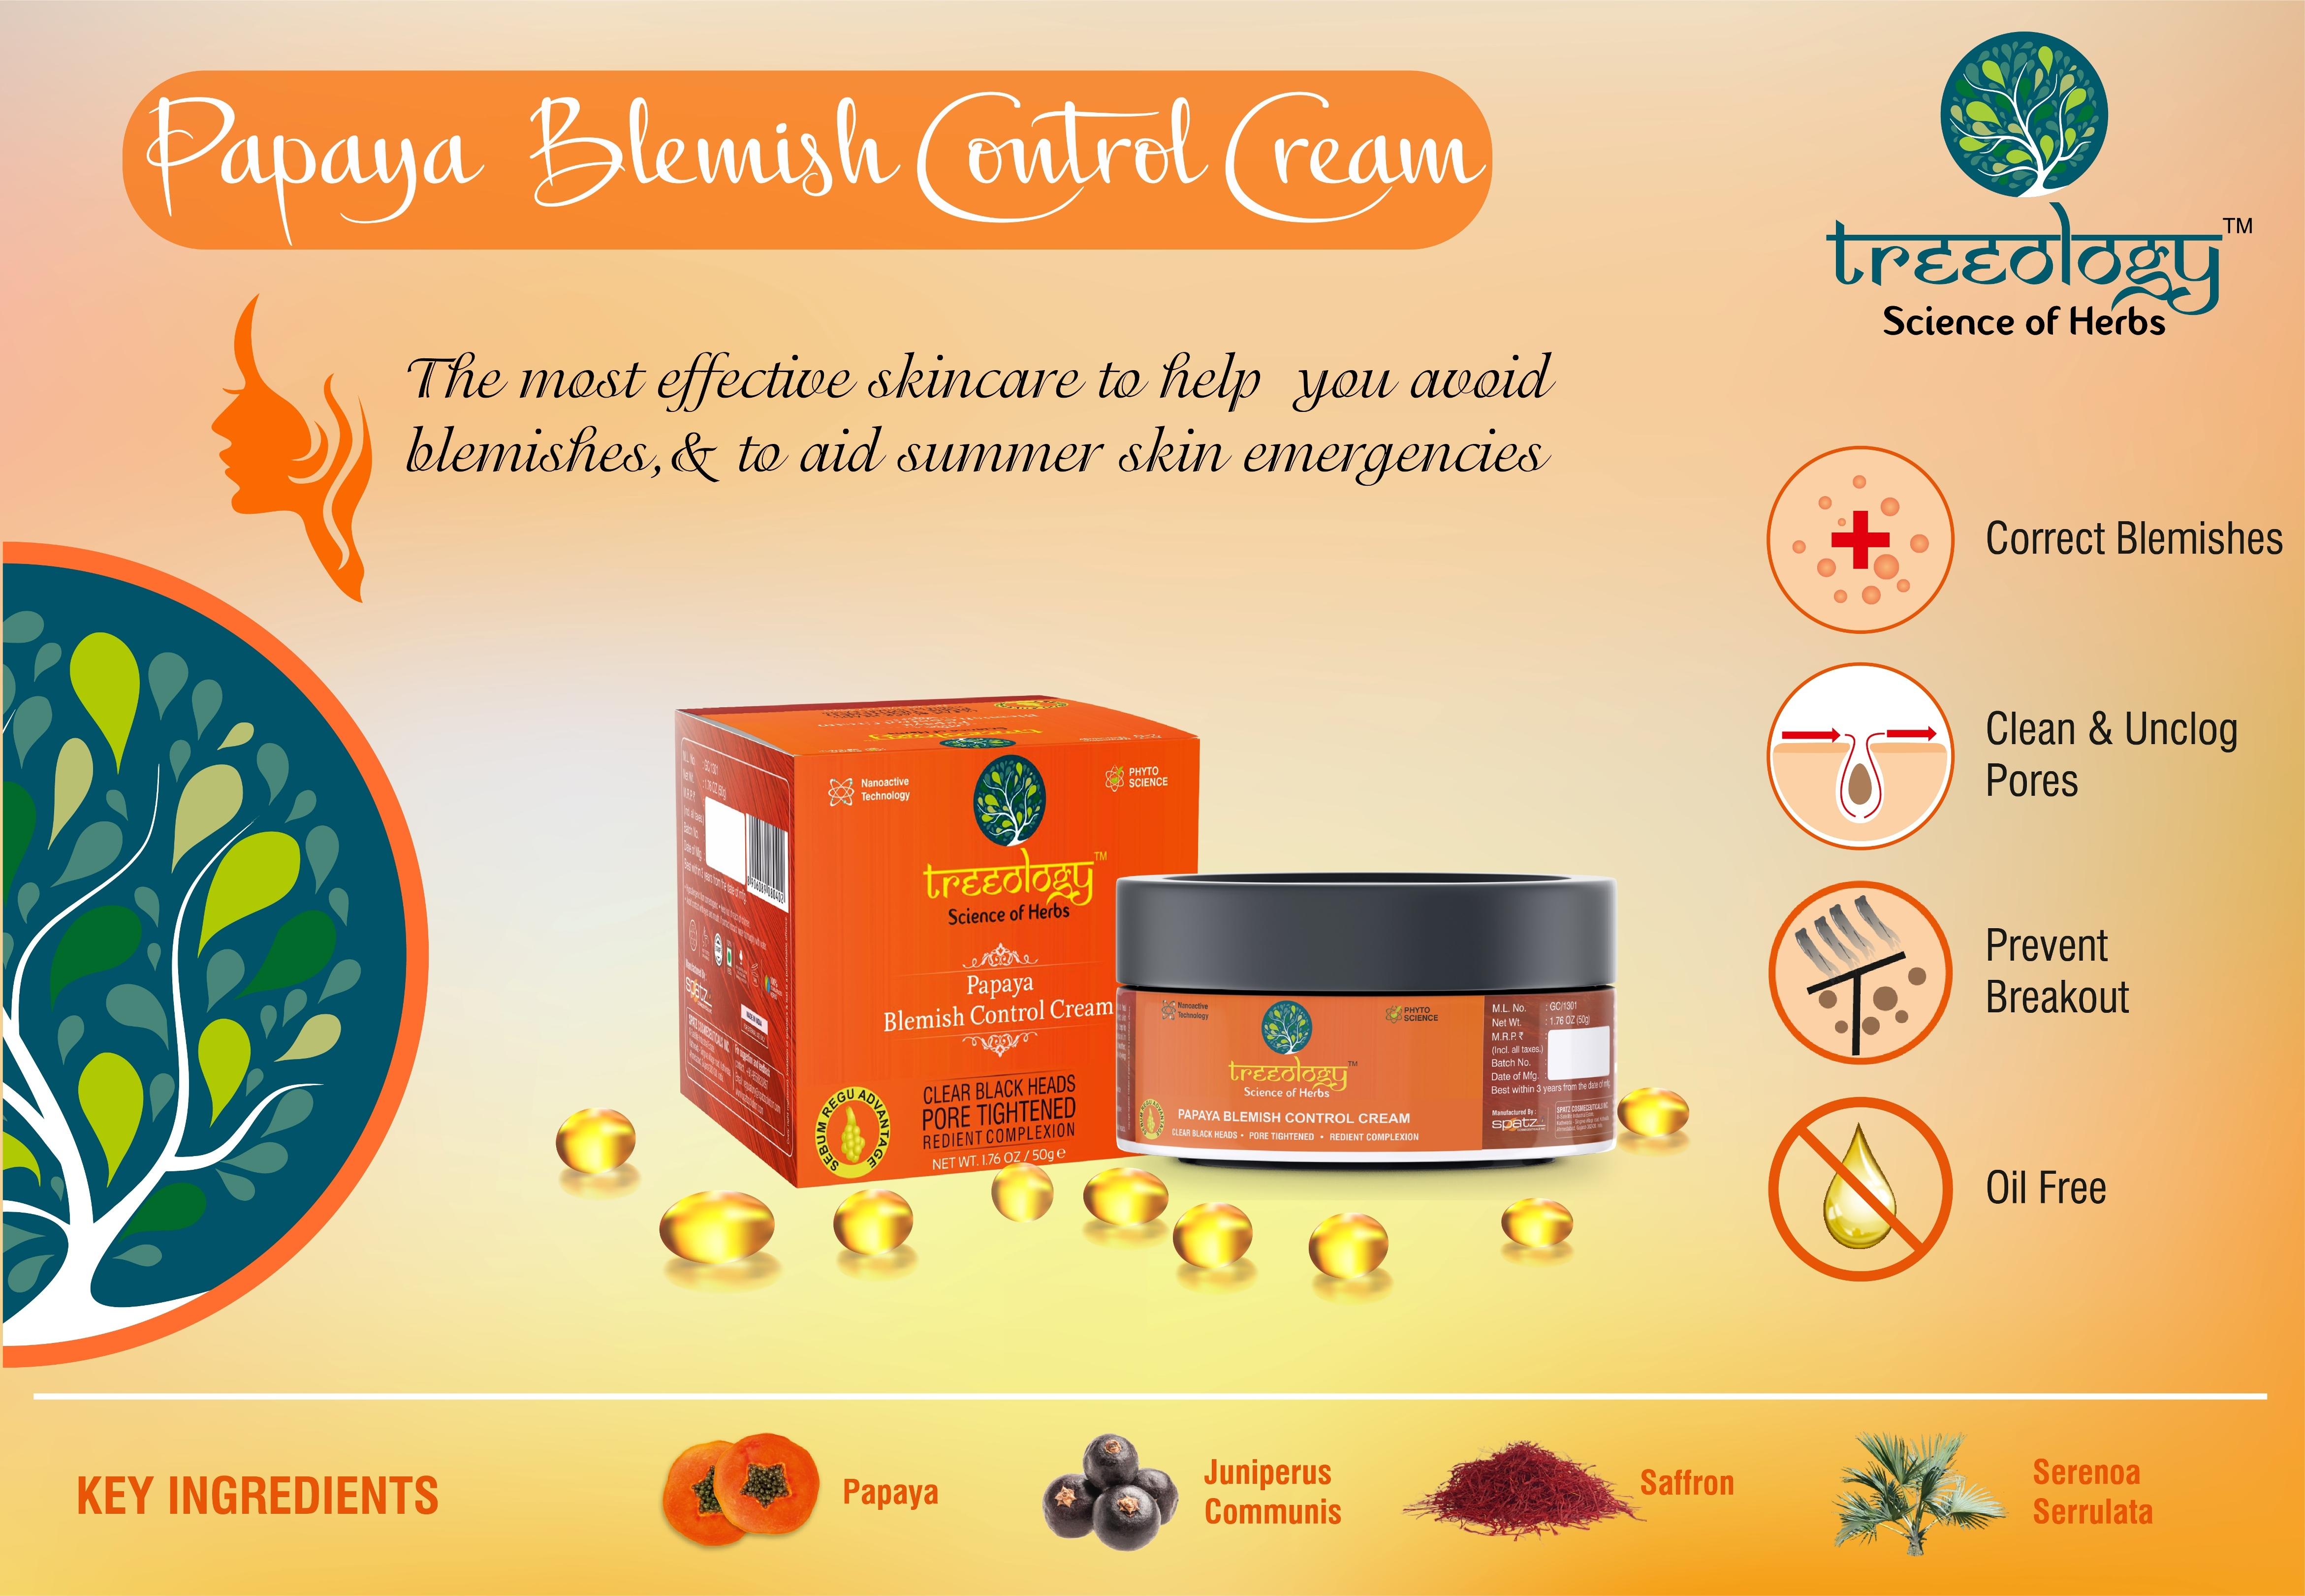 Blemish Removal Cream